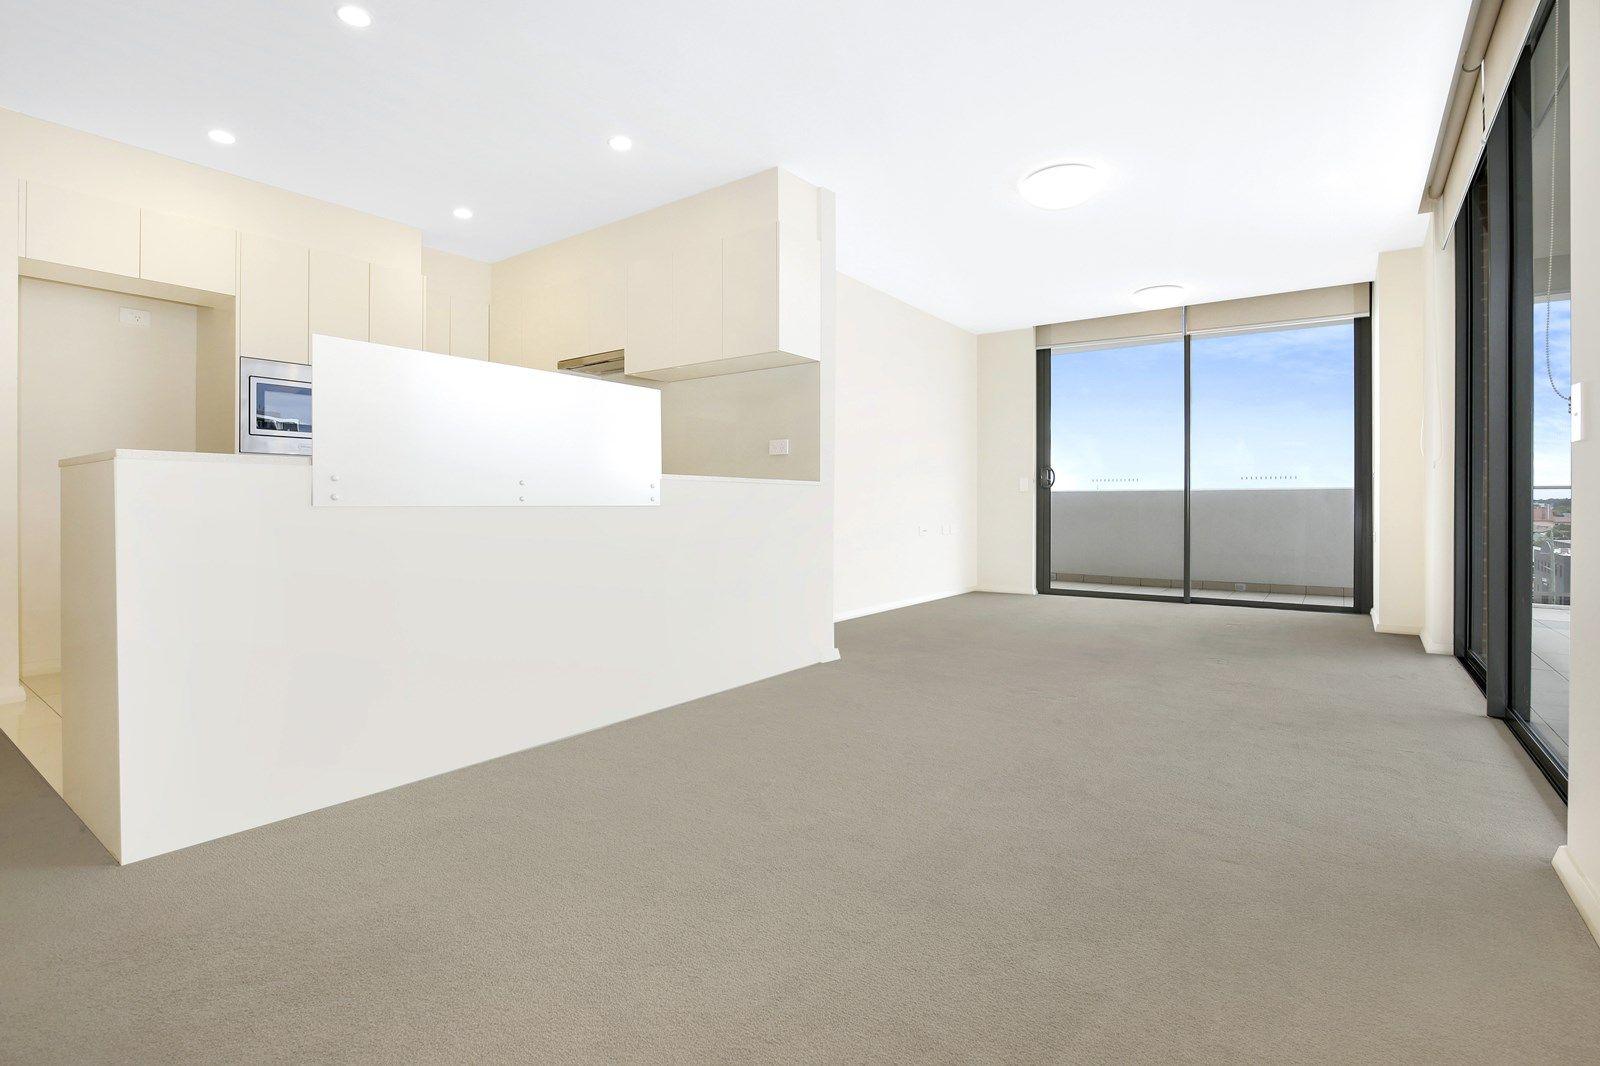 402/27 Atchison Street, Wollongong NSW 2500, Image 1